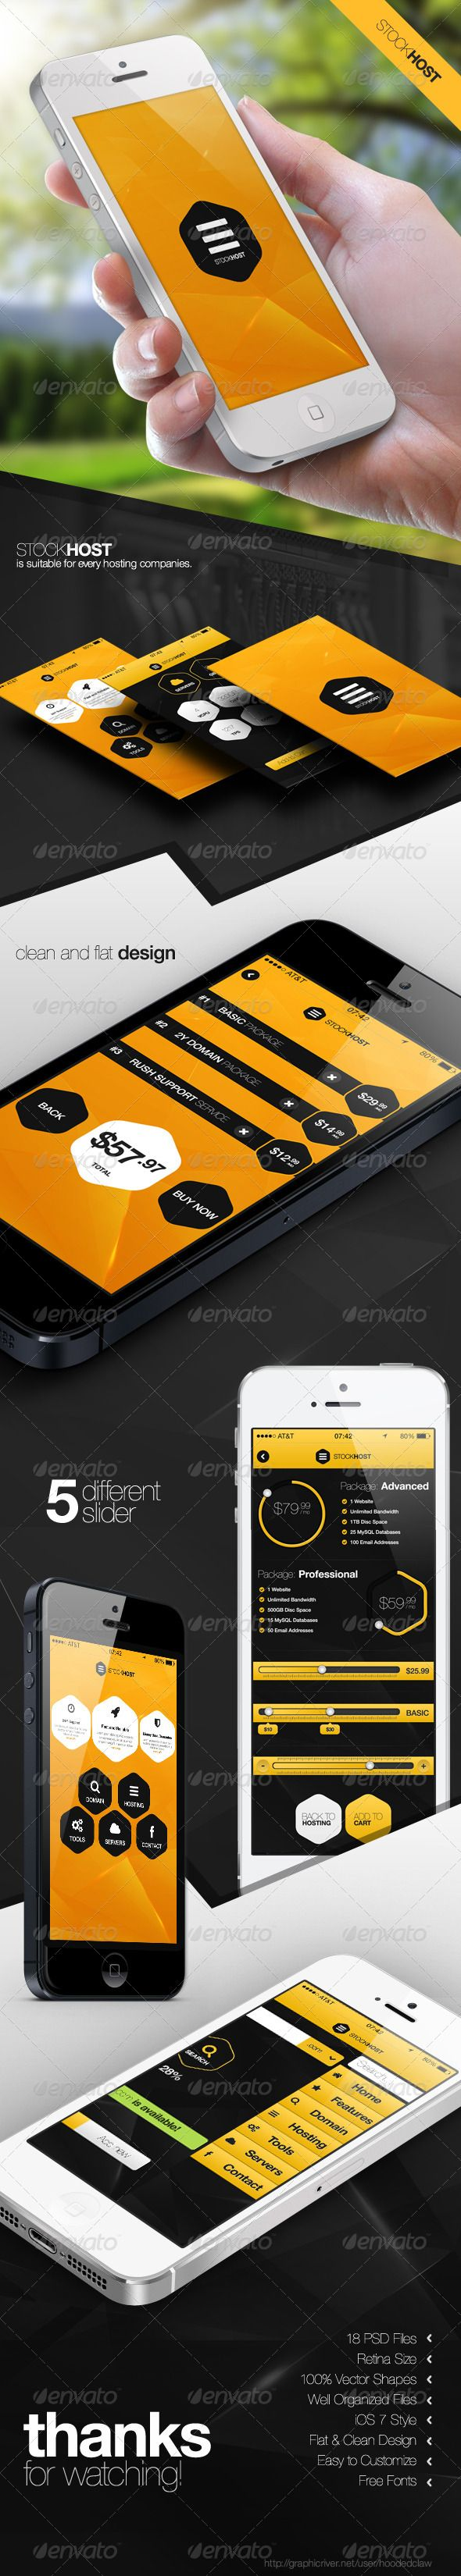 stock host retina mobile user interface